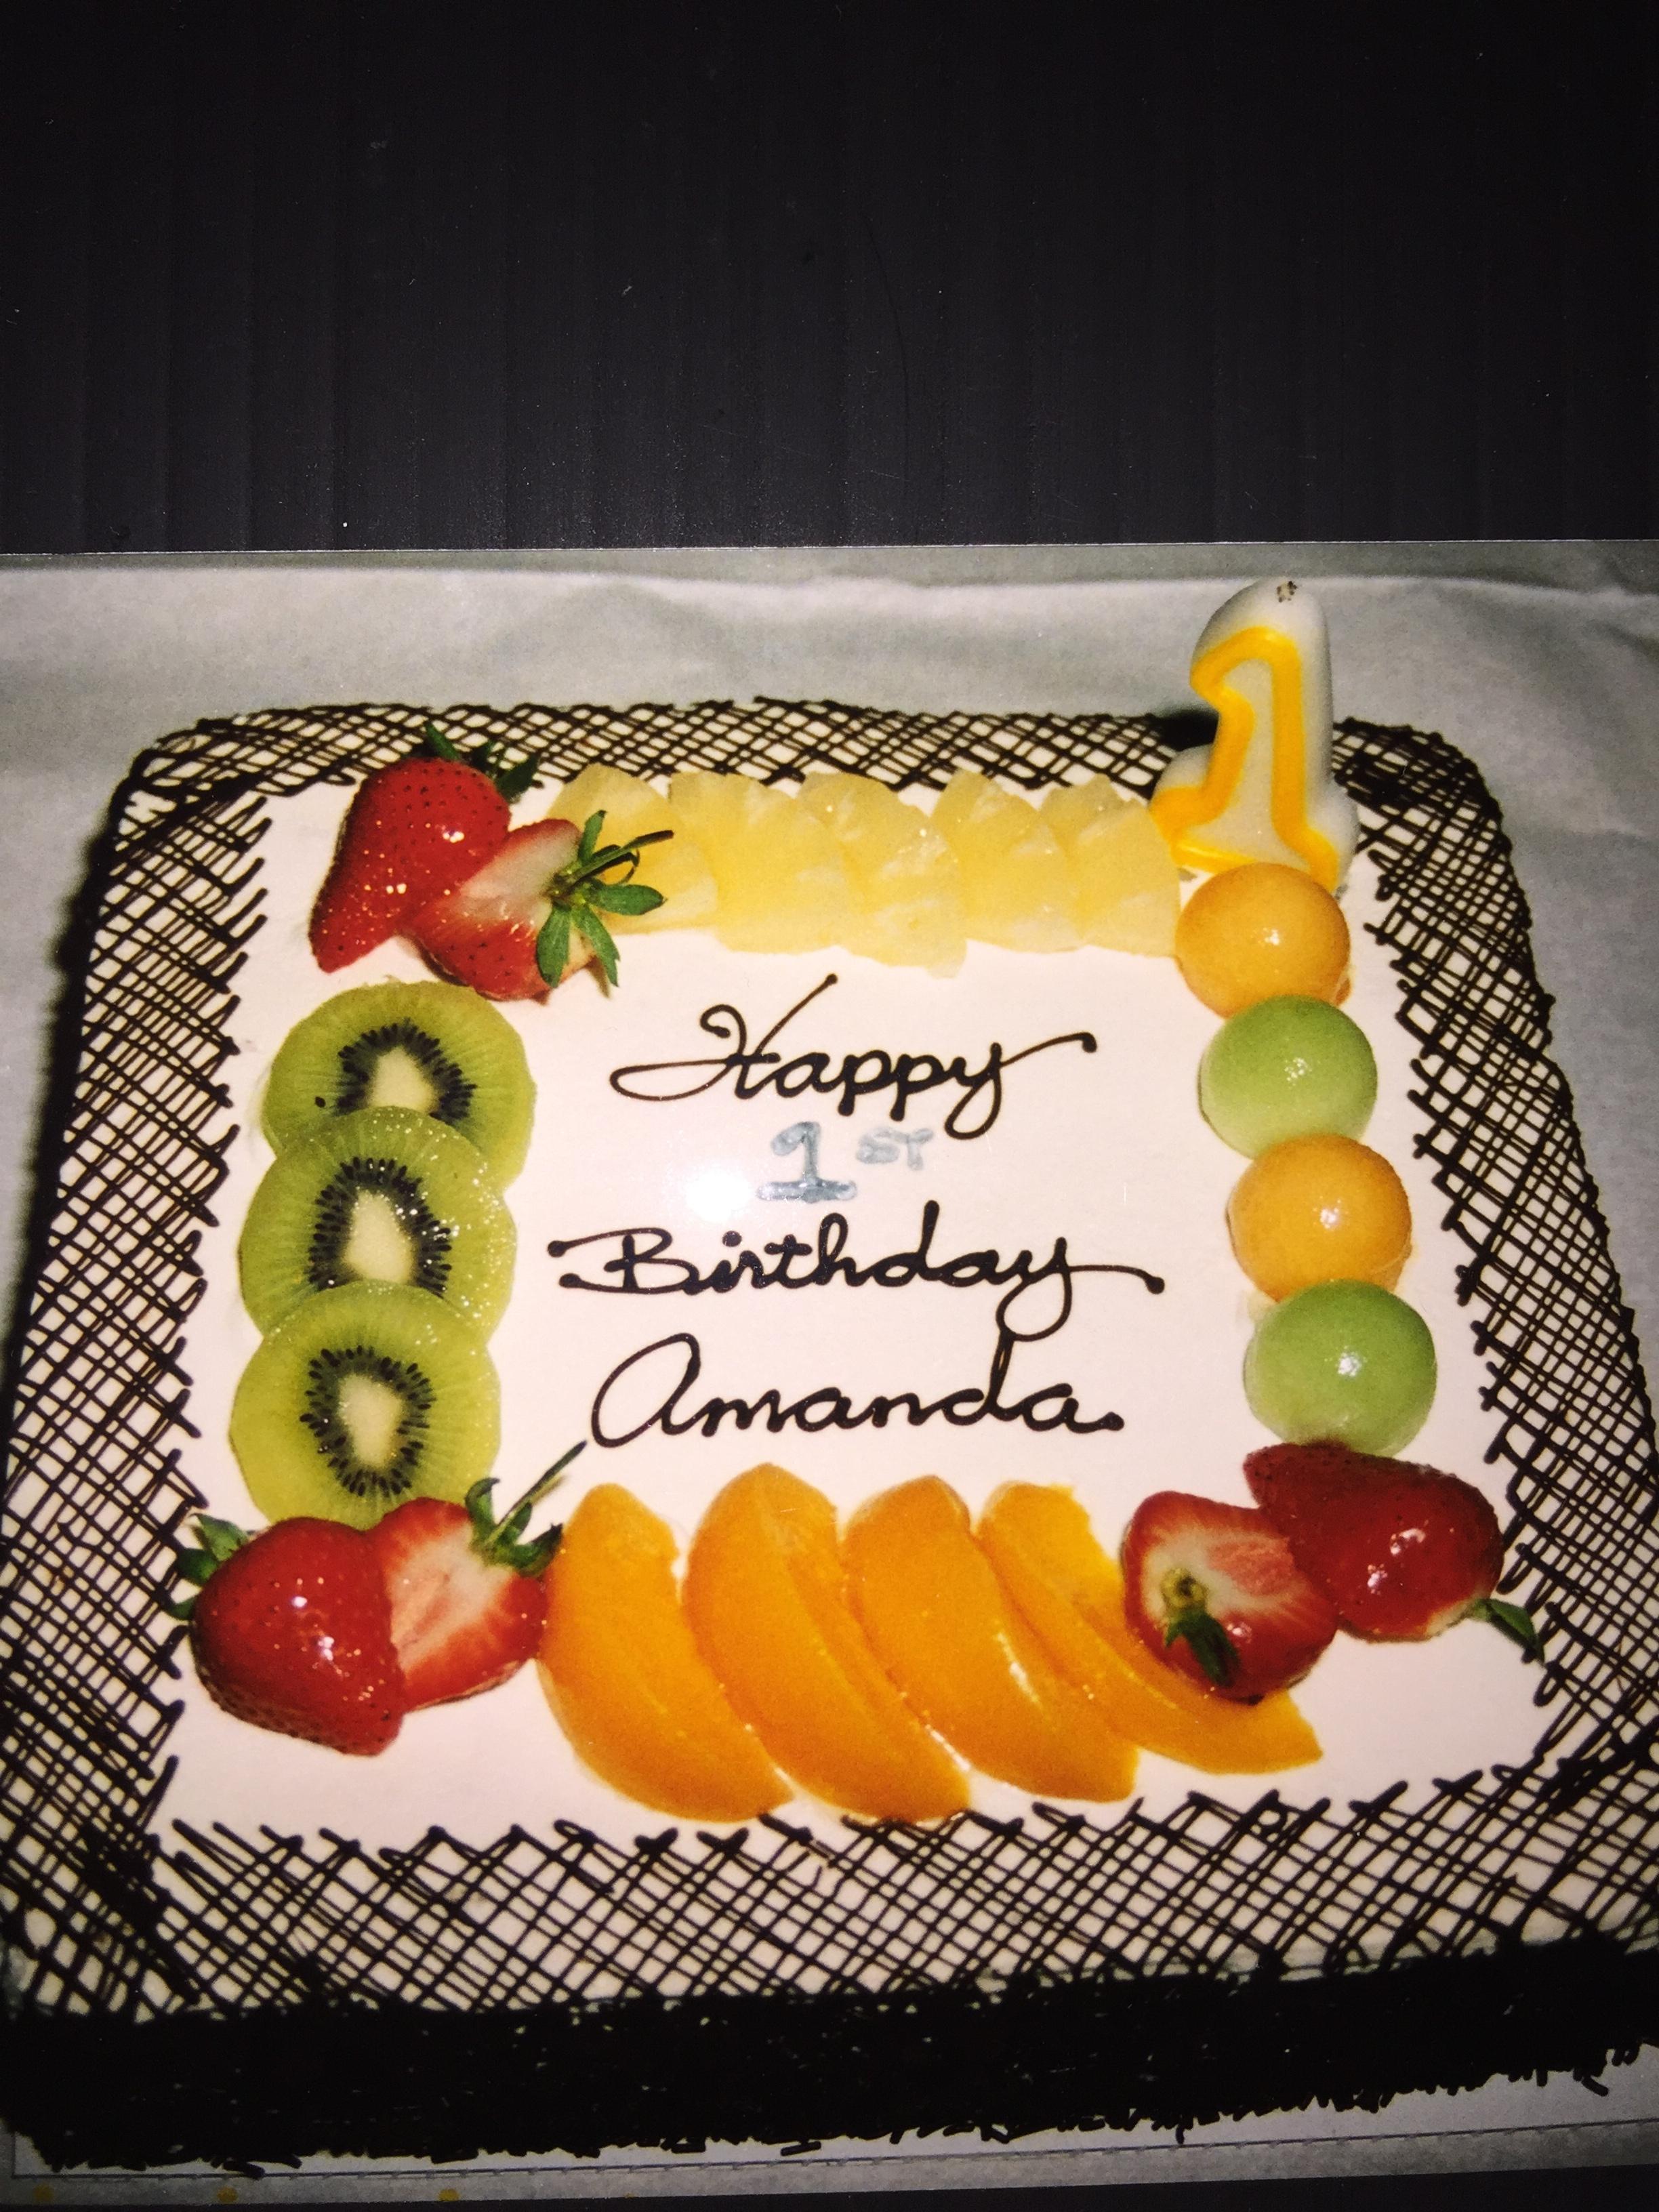 Happy Birthday Amanda Cake Brithday Cake